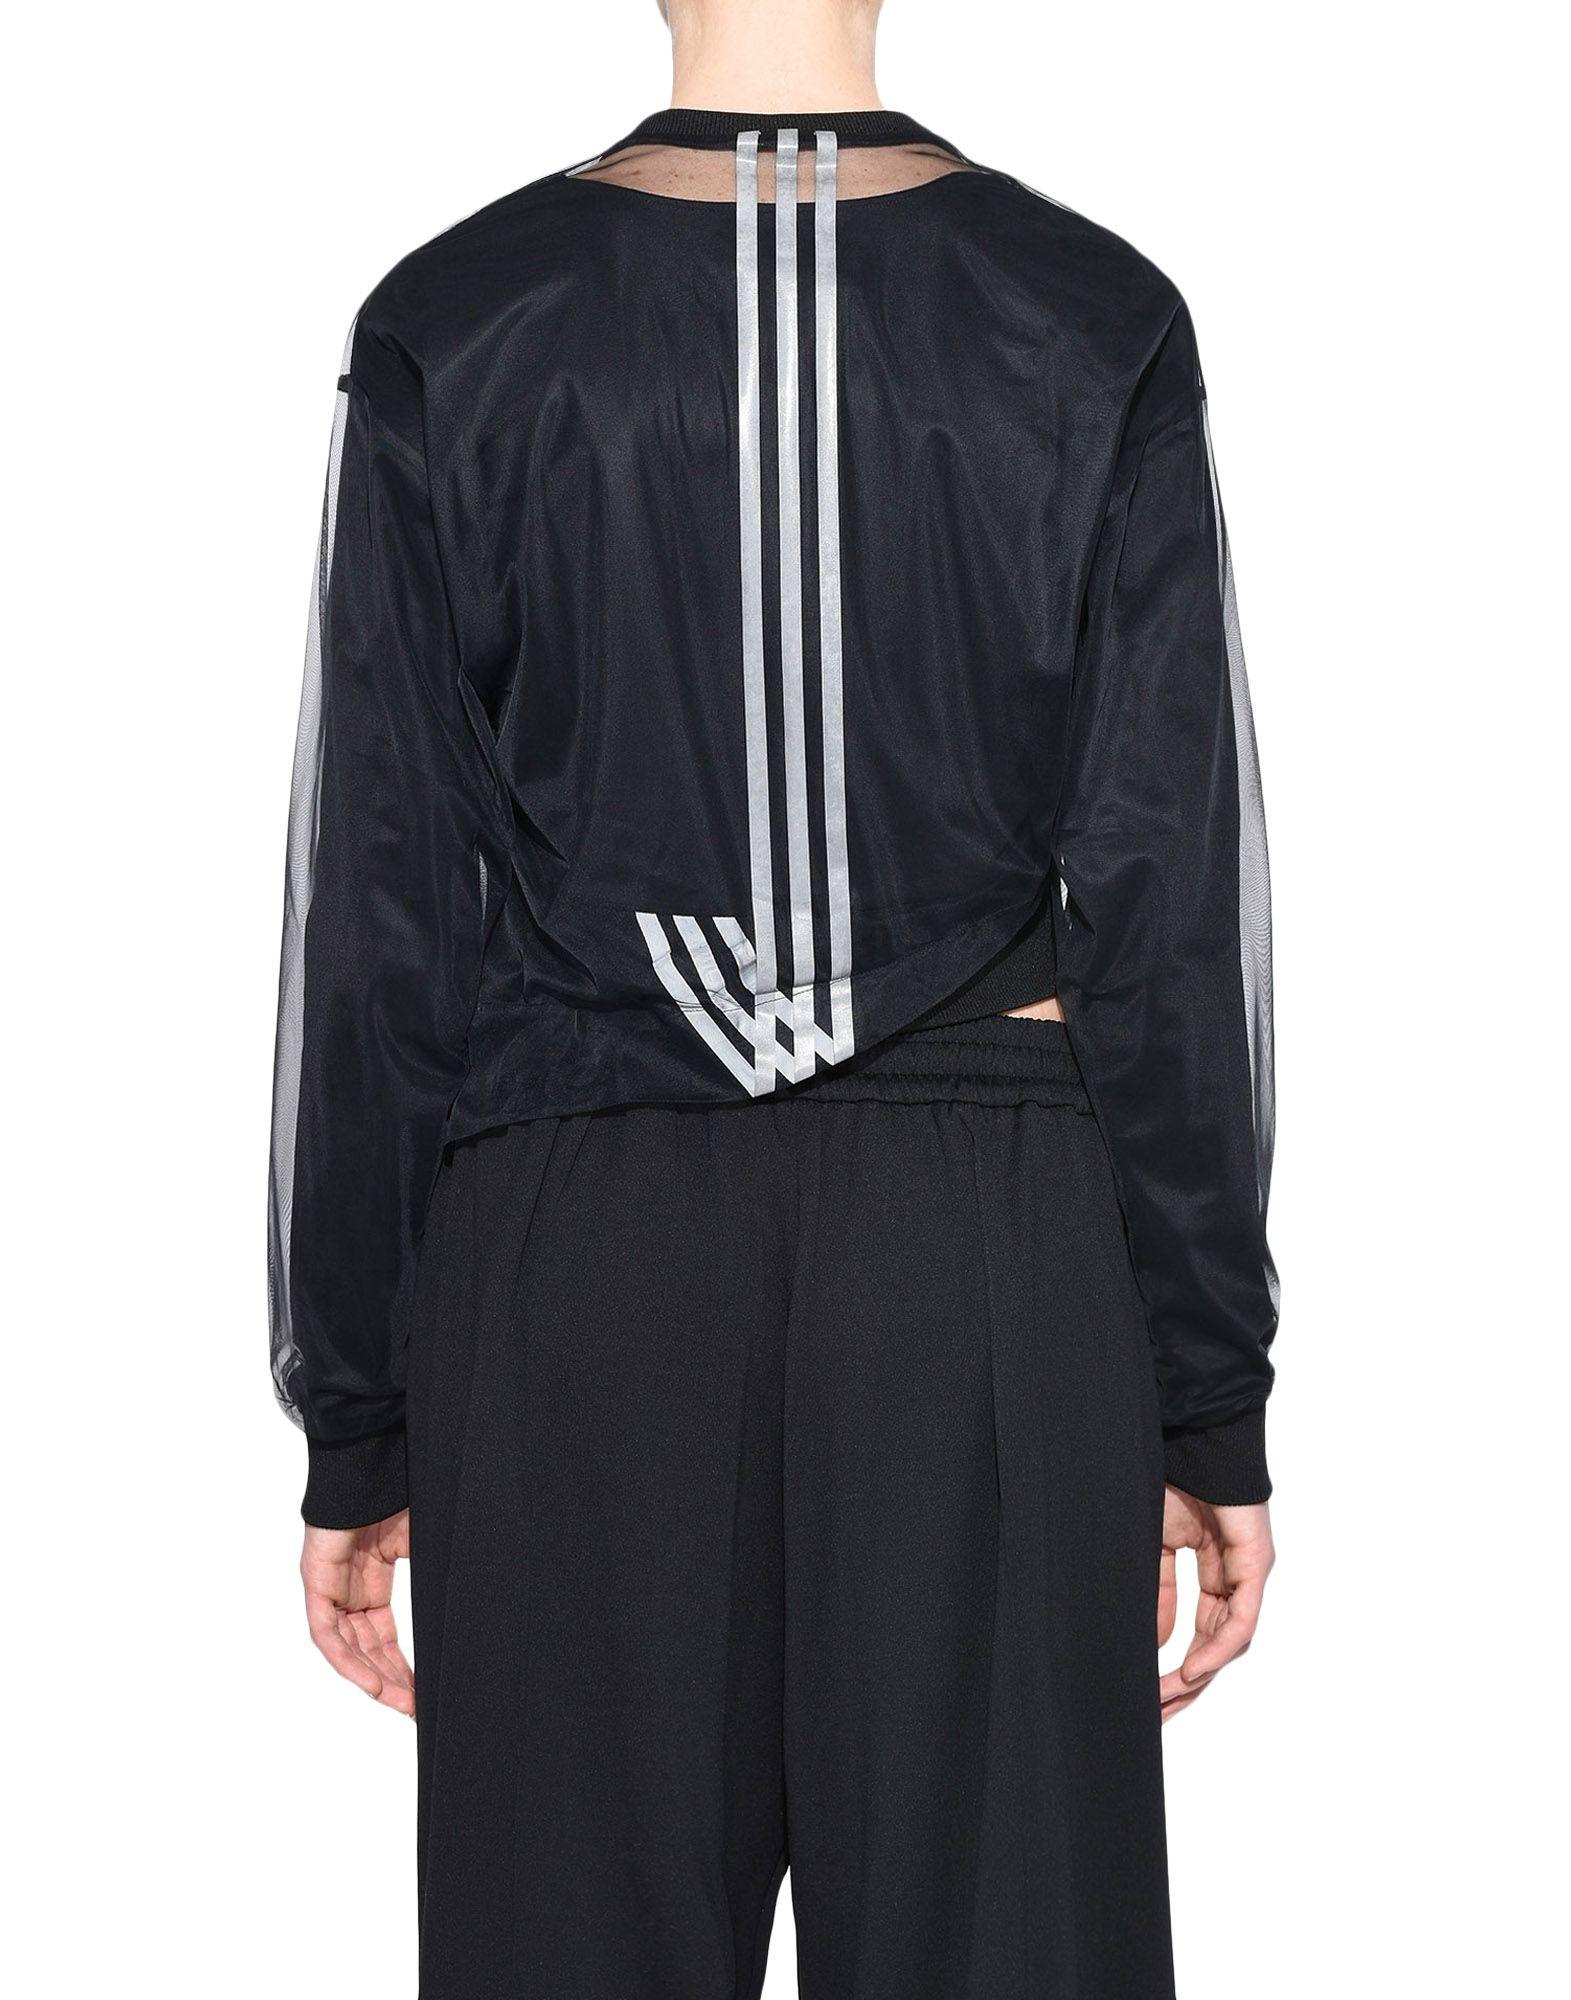 Y-3 Y-3 3-Stripes Mesh Cropped Tee Long sleeve t-shirt Woman d